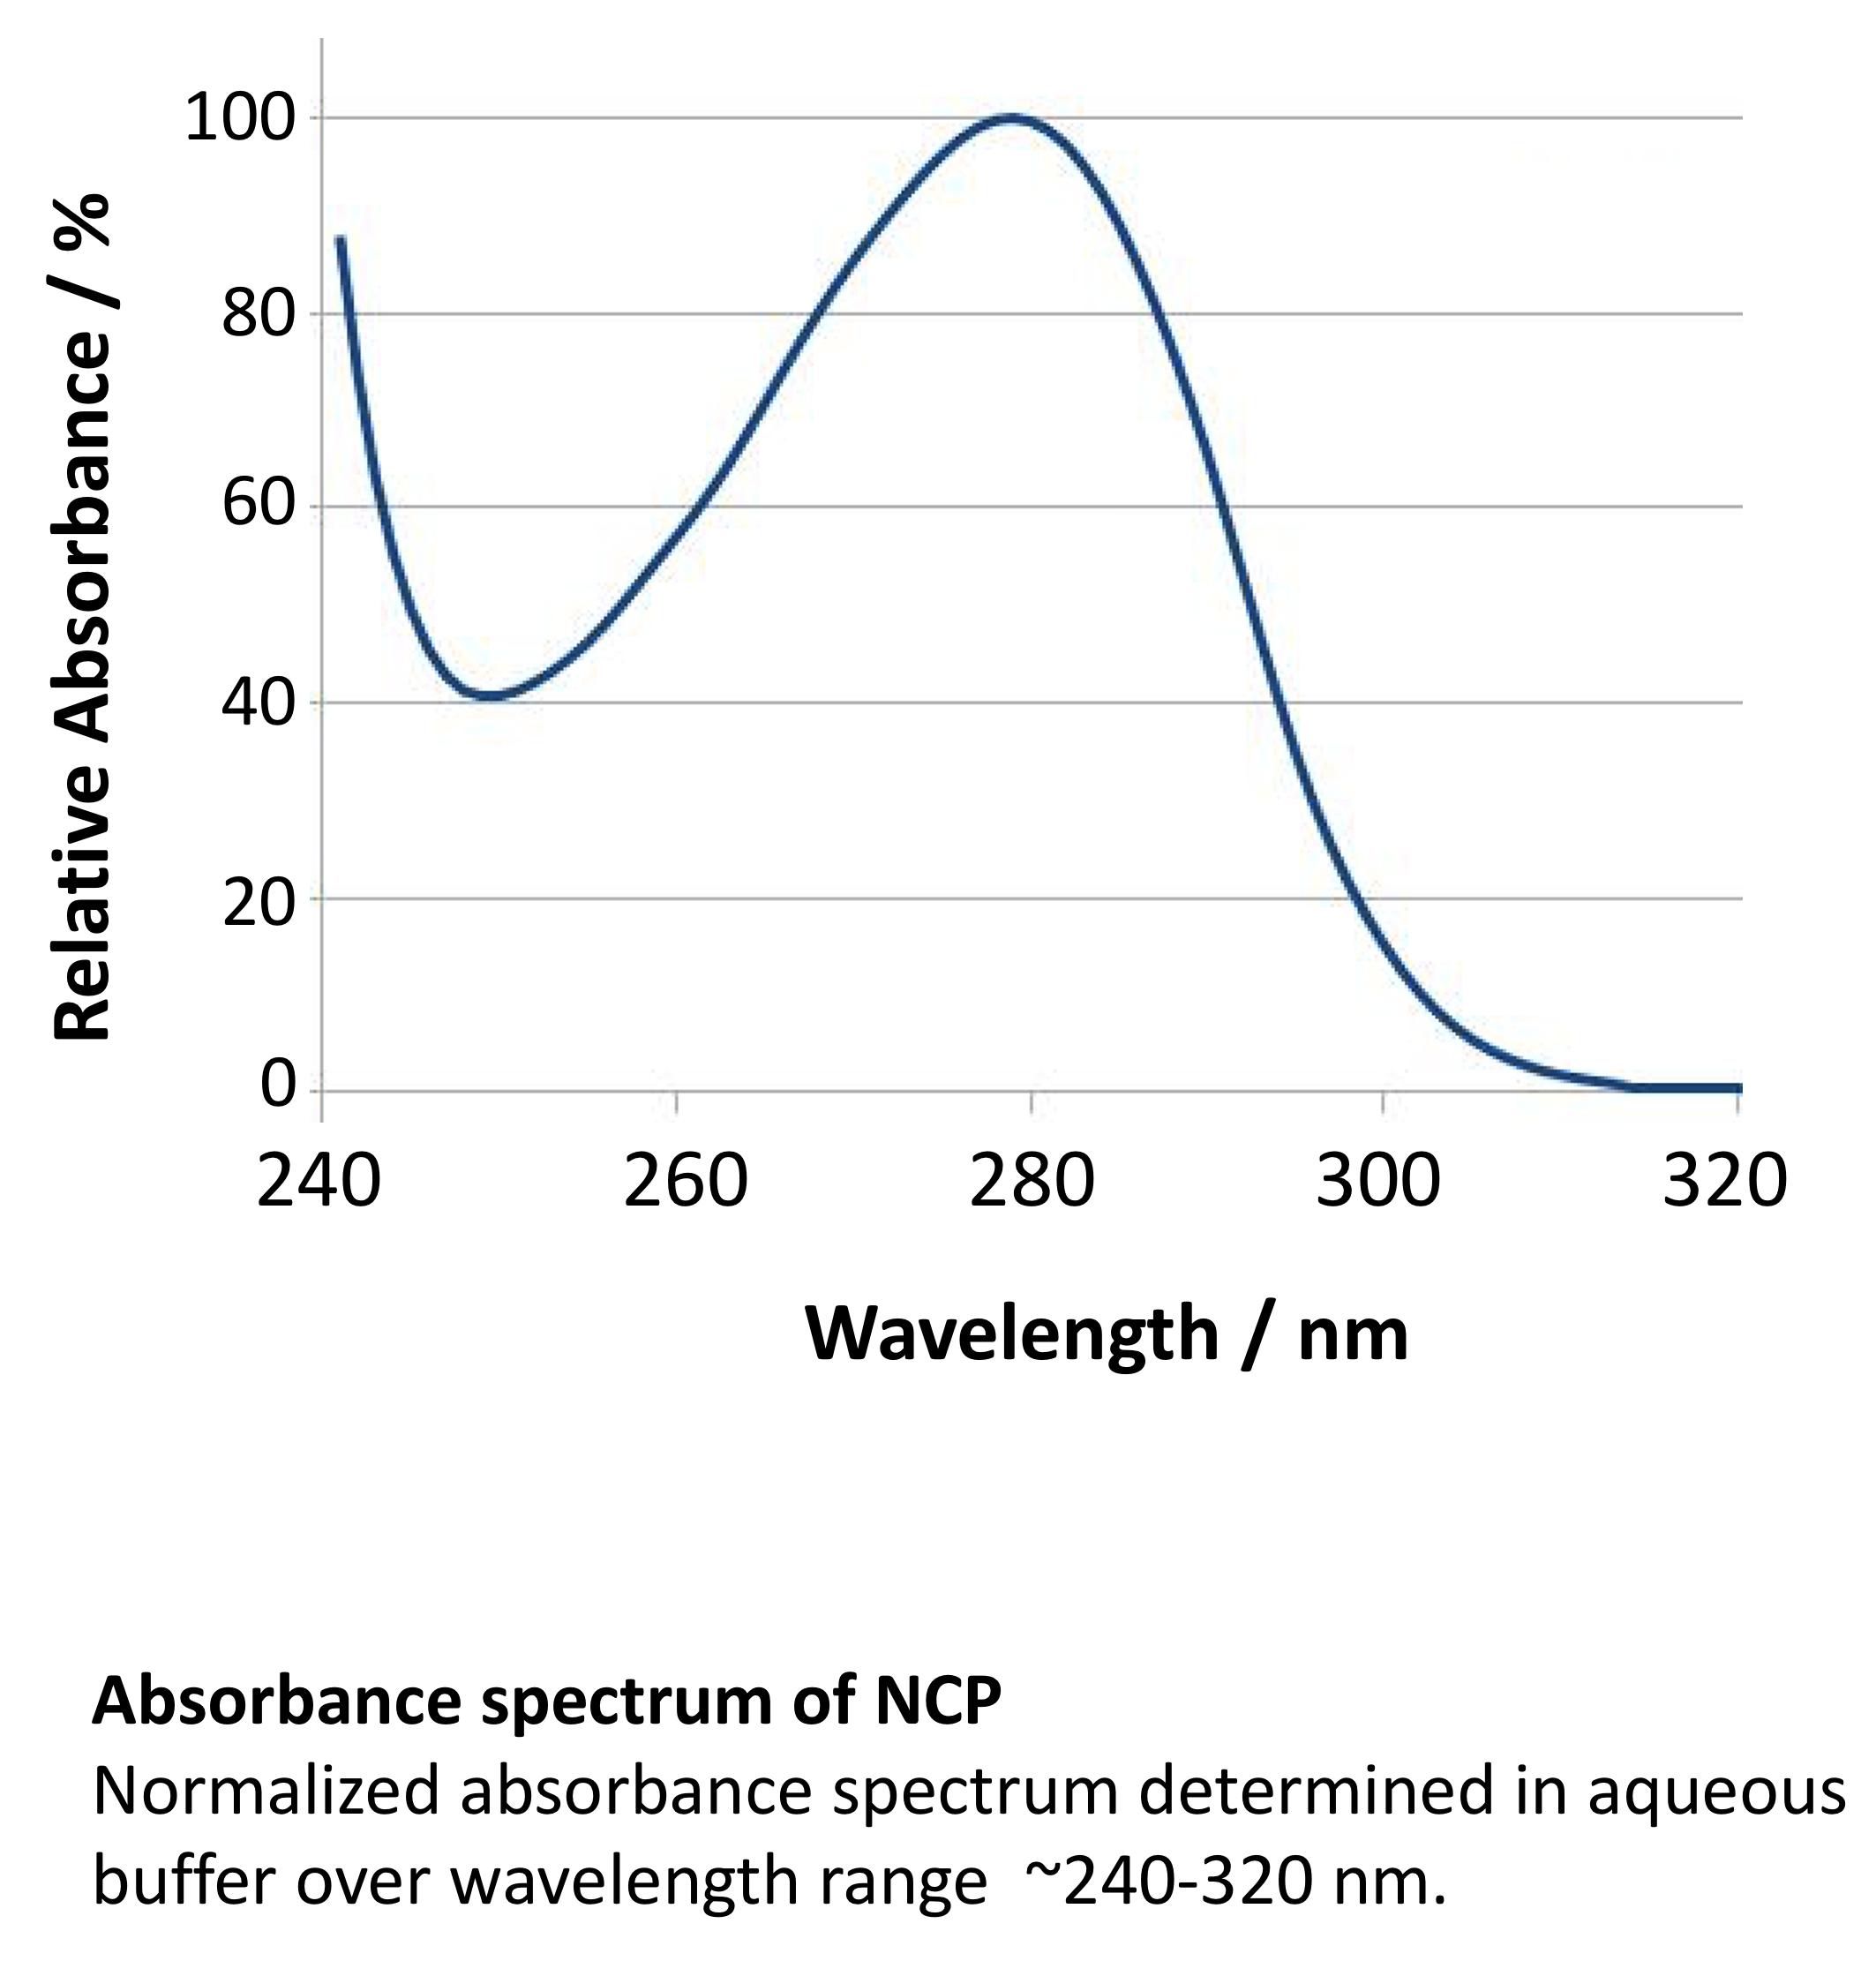 Absorbance spectrum of NCP